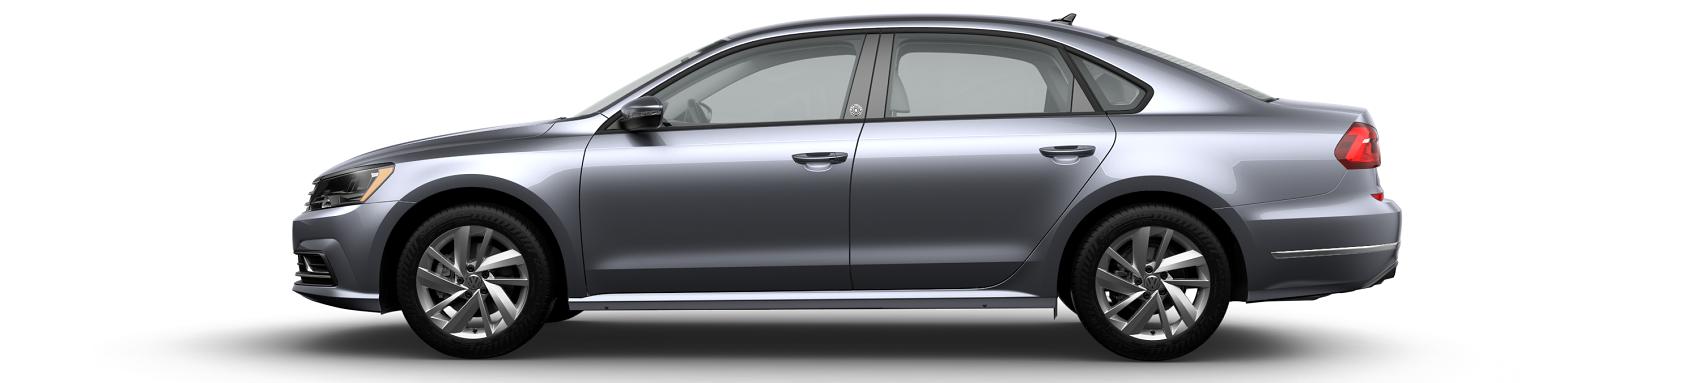 Volkswagen Passat Wolfsburg Platnium Gray